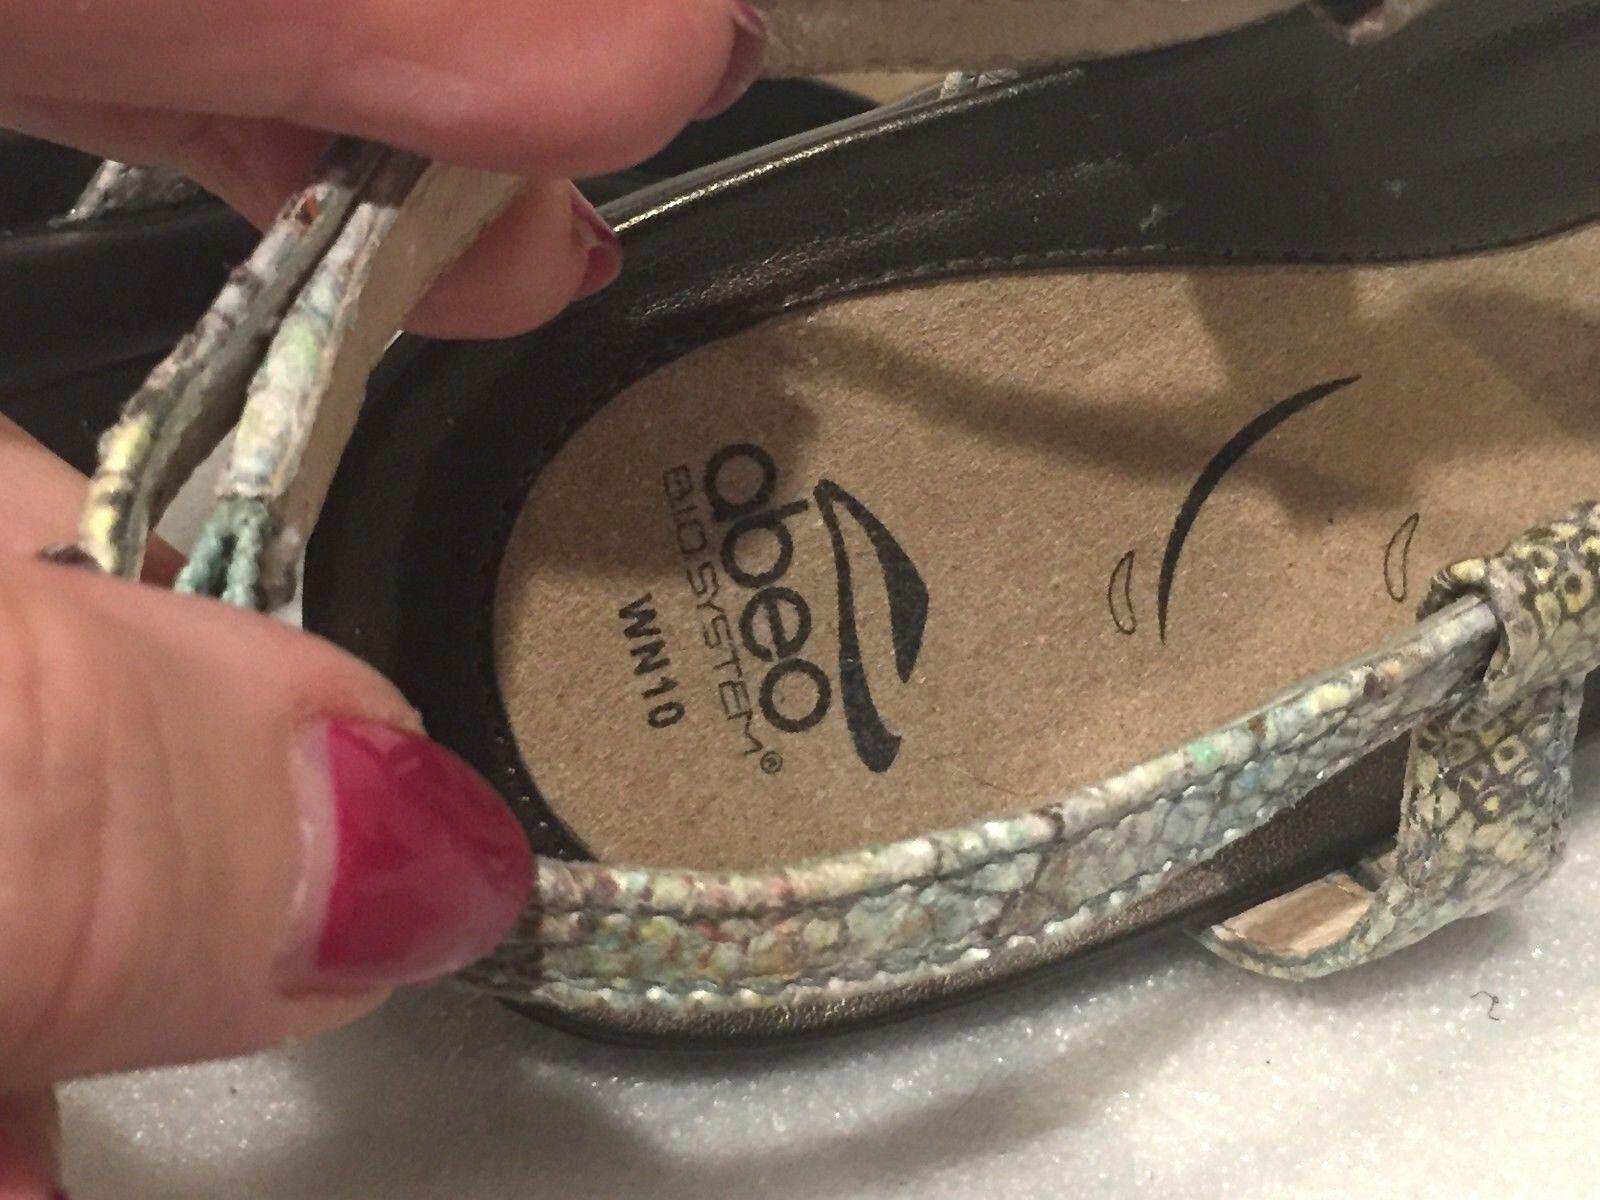 ABEO B.i.0. System 10 W N Georgie Neutral Metallic Leather Leather Leather DRESS Sandals b6c61b